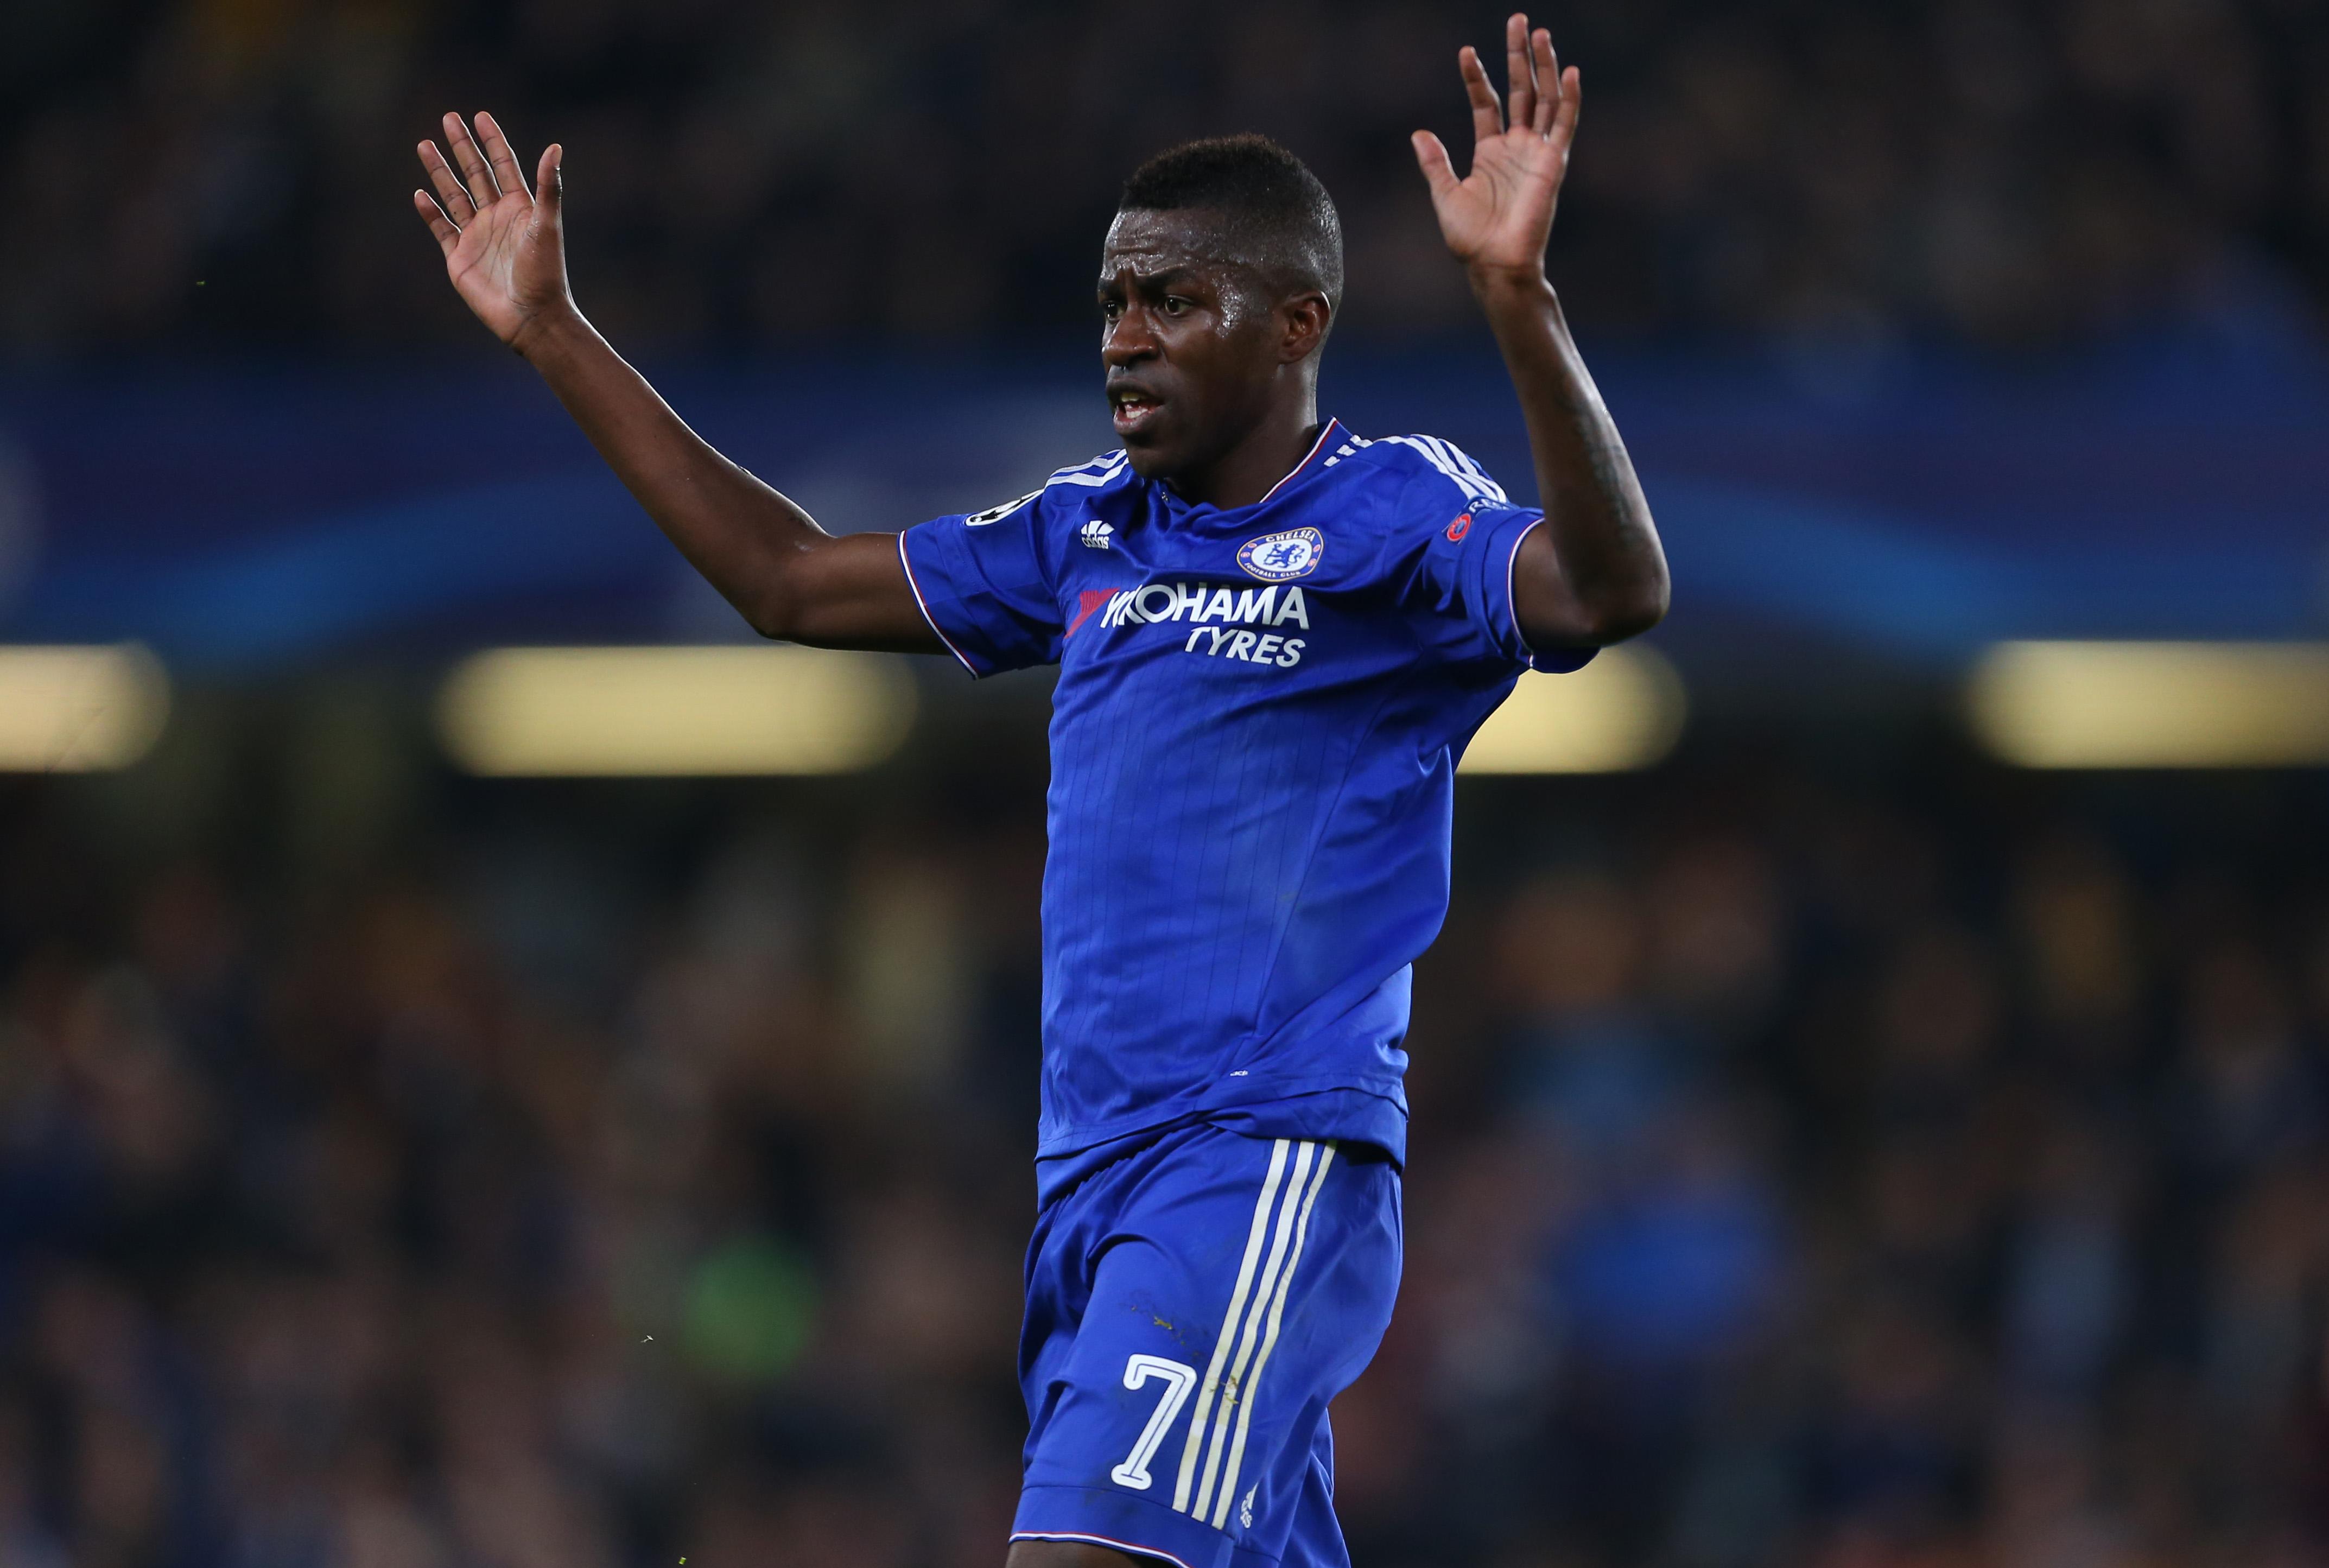 Borussia Dortmund eye transfer of Chelsea's Ramires to replace Liverpool target Ilkay Gundogan – report